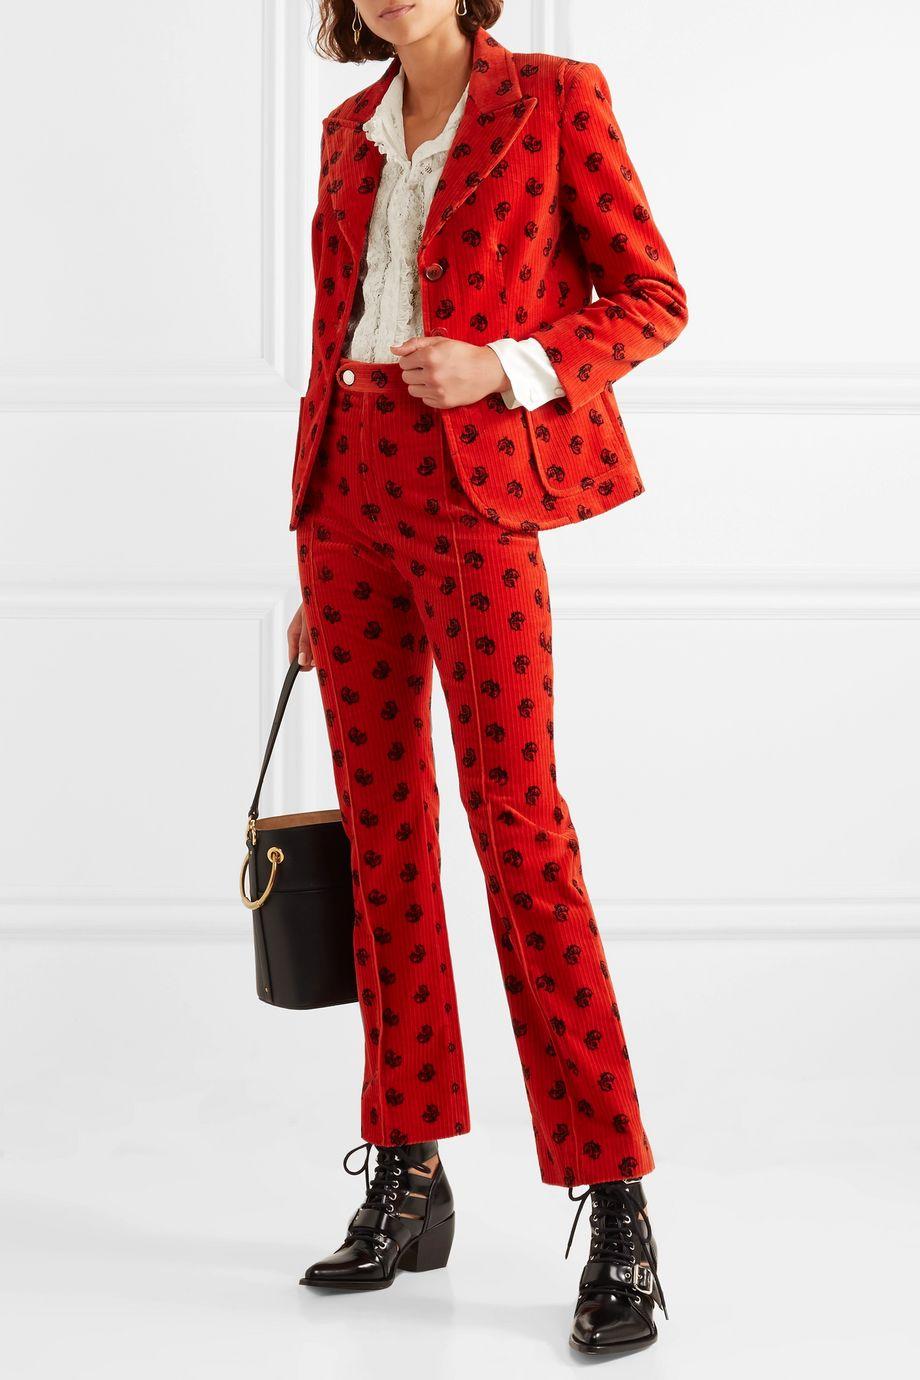 Chloé Ruffled silk-trimmed cotton-blend lace blouse